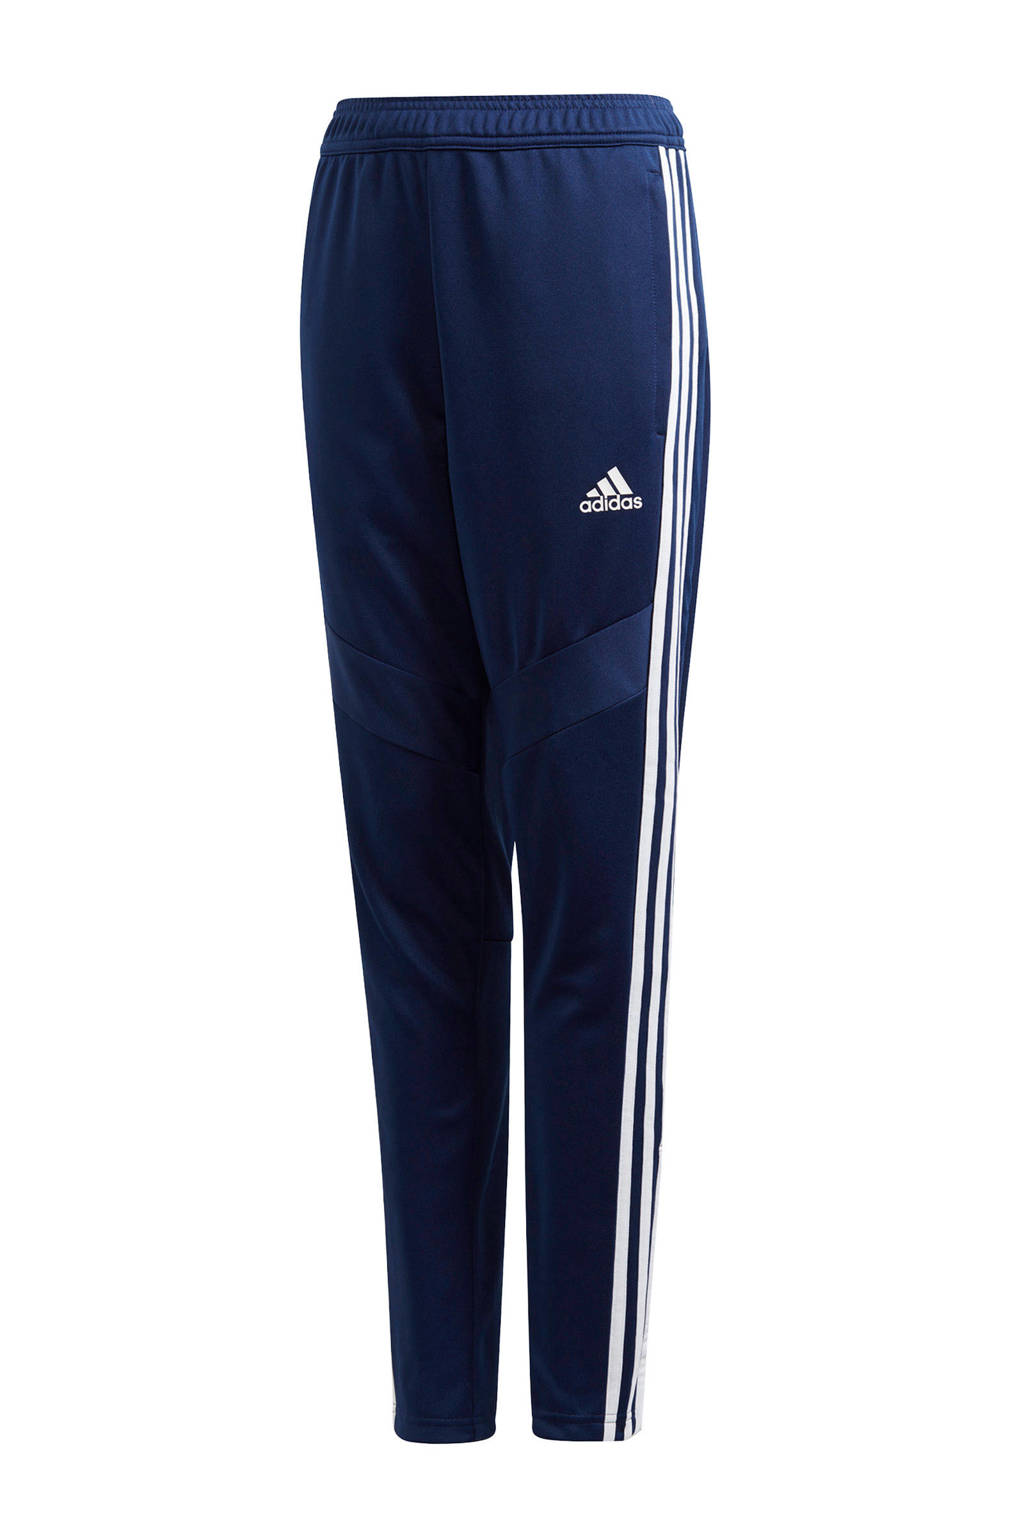 adidas performance   sportbroek donkerblauw, Donkerblauw/wit